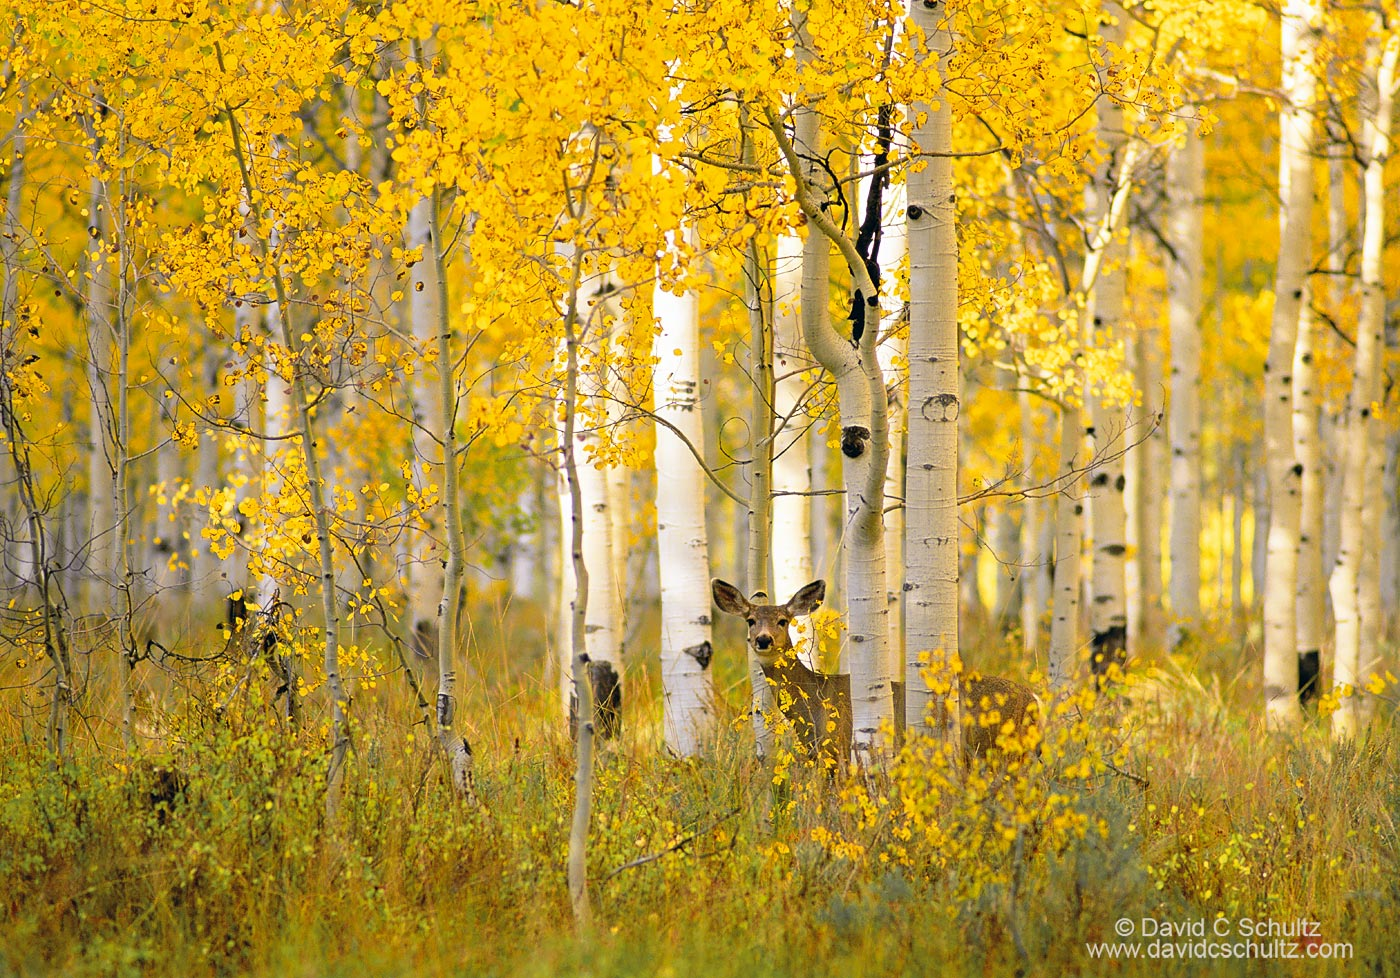 Fall and a mule deer in a grove of aspen trees Sundance, Utah - Image #3-1712